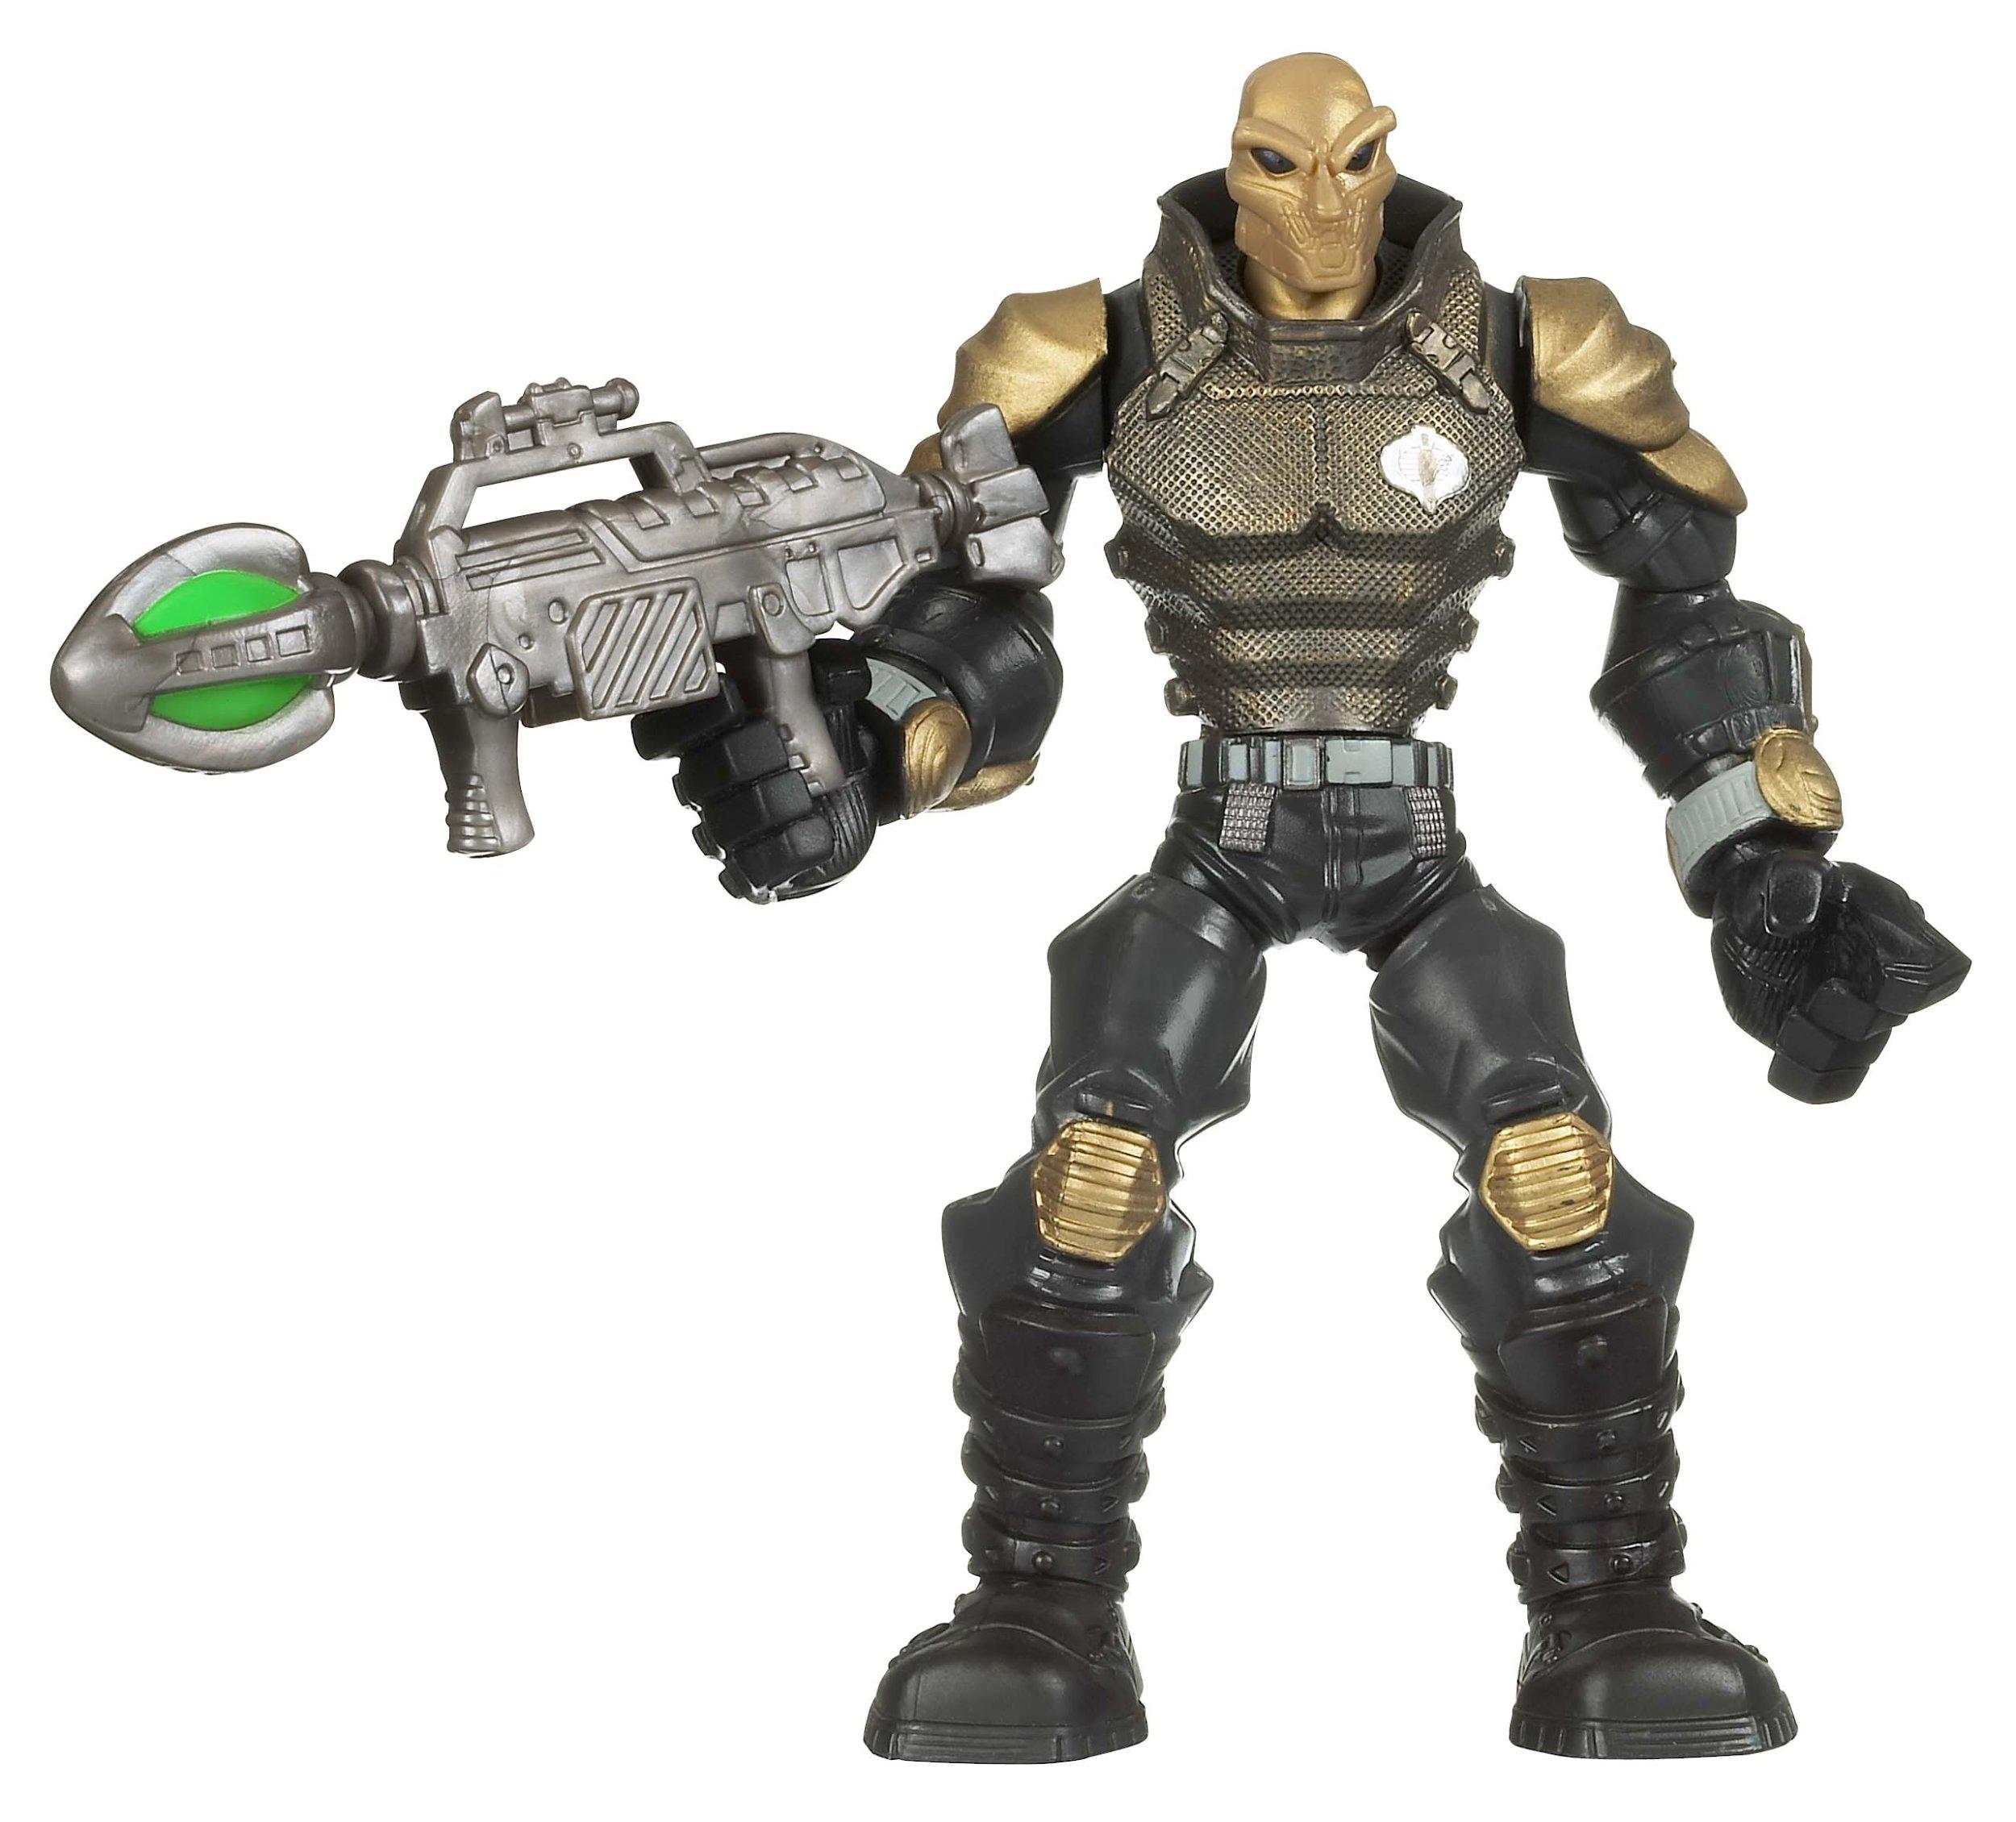 GI Joe Movie Action Battlers Cobra Viper